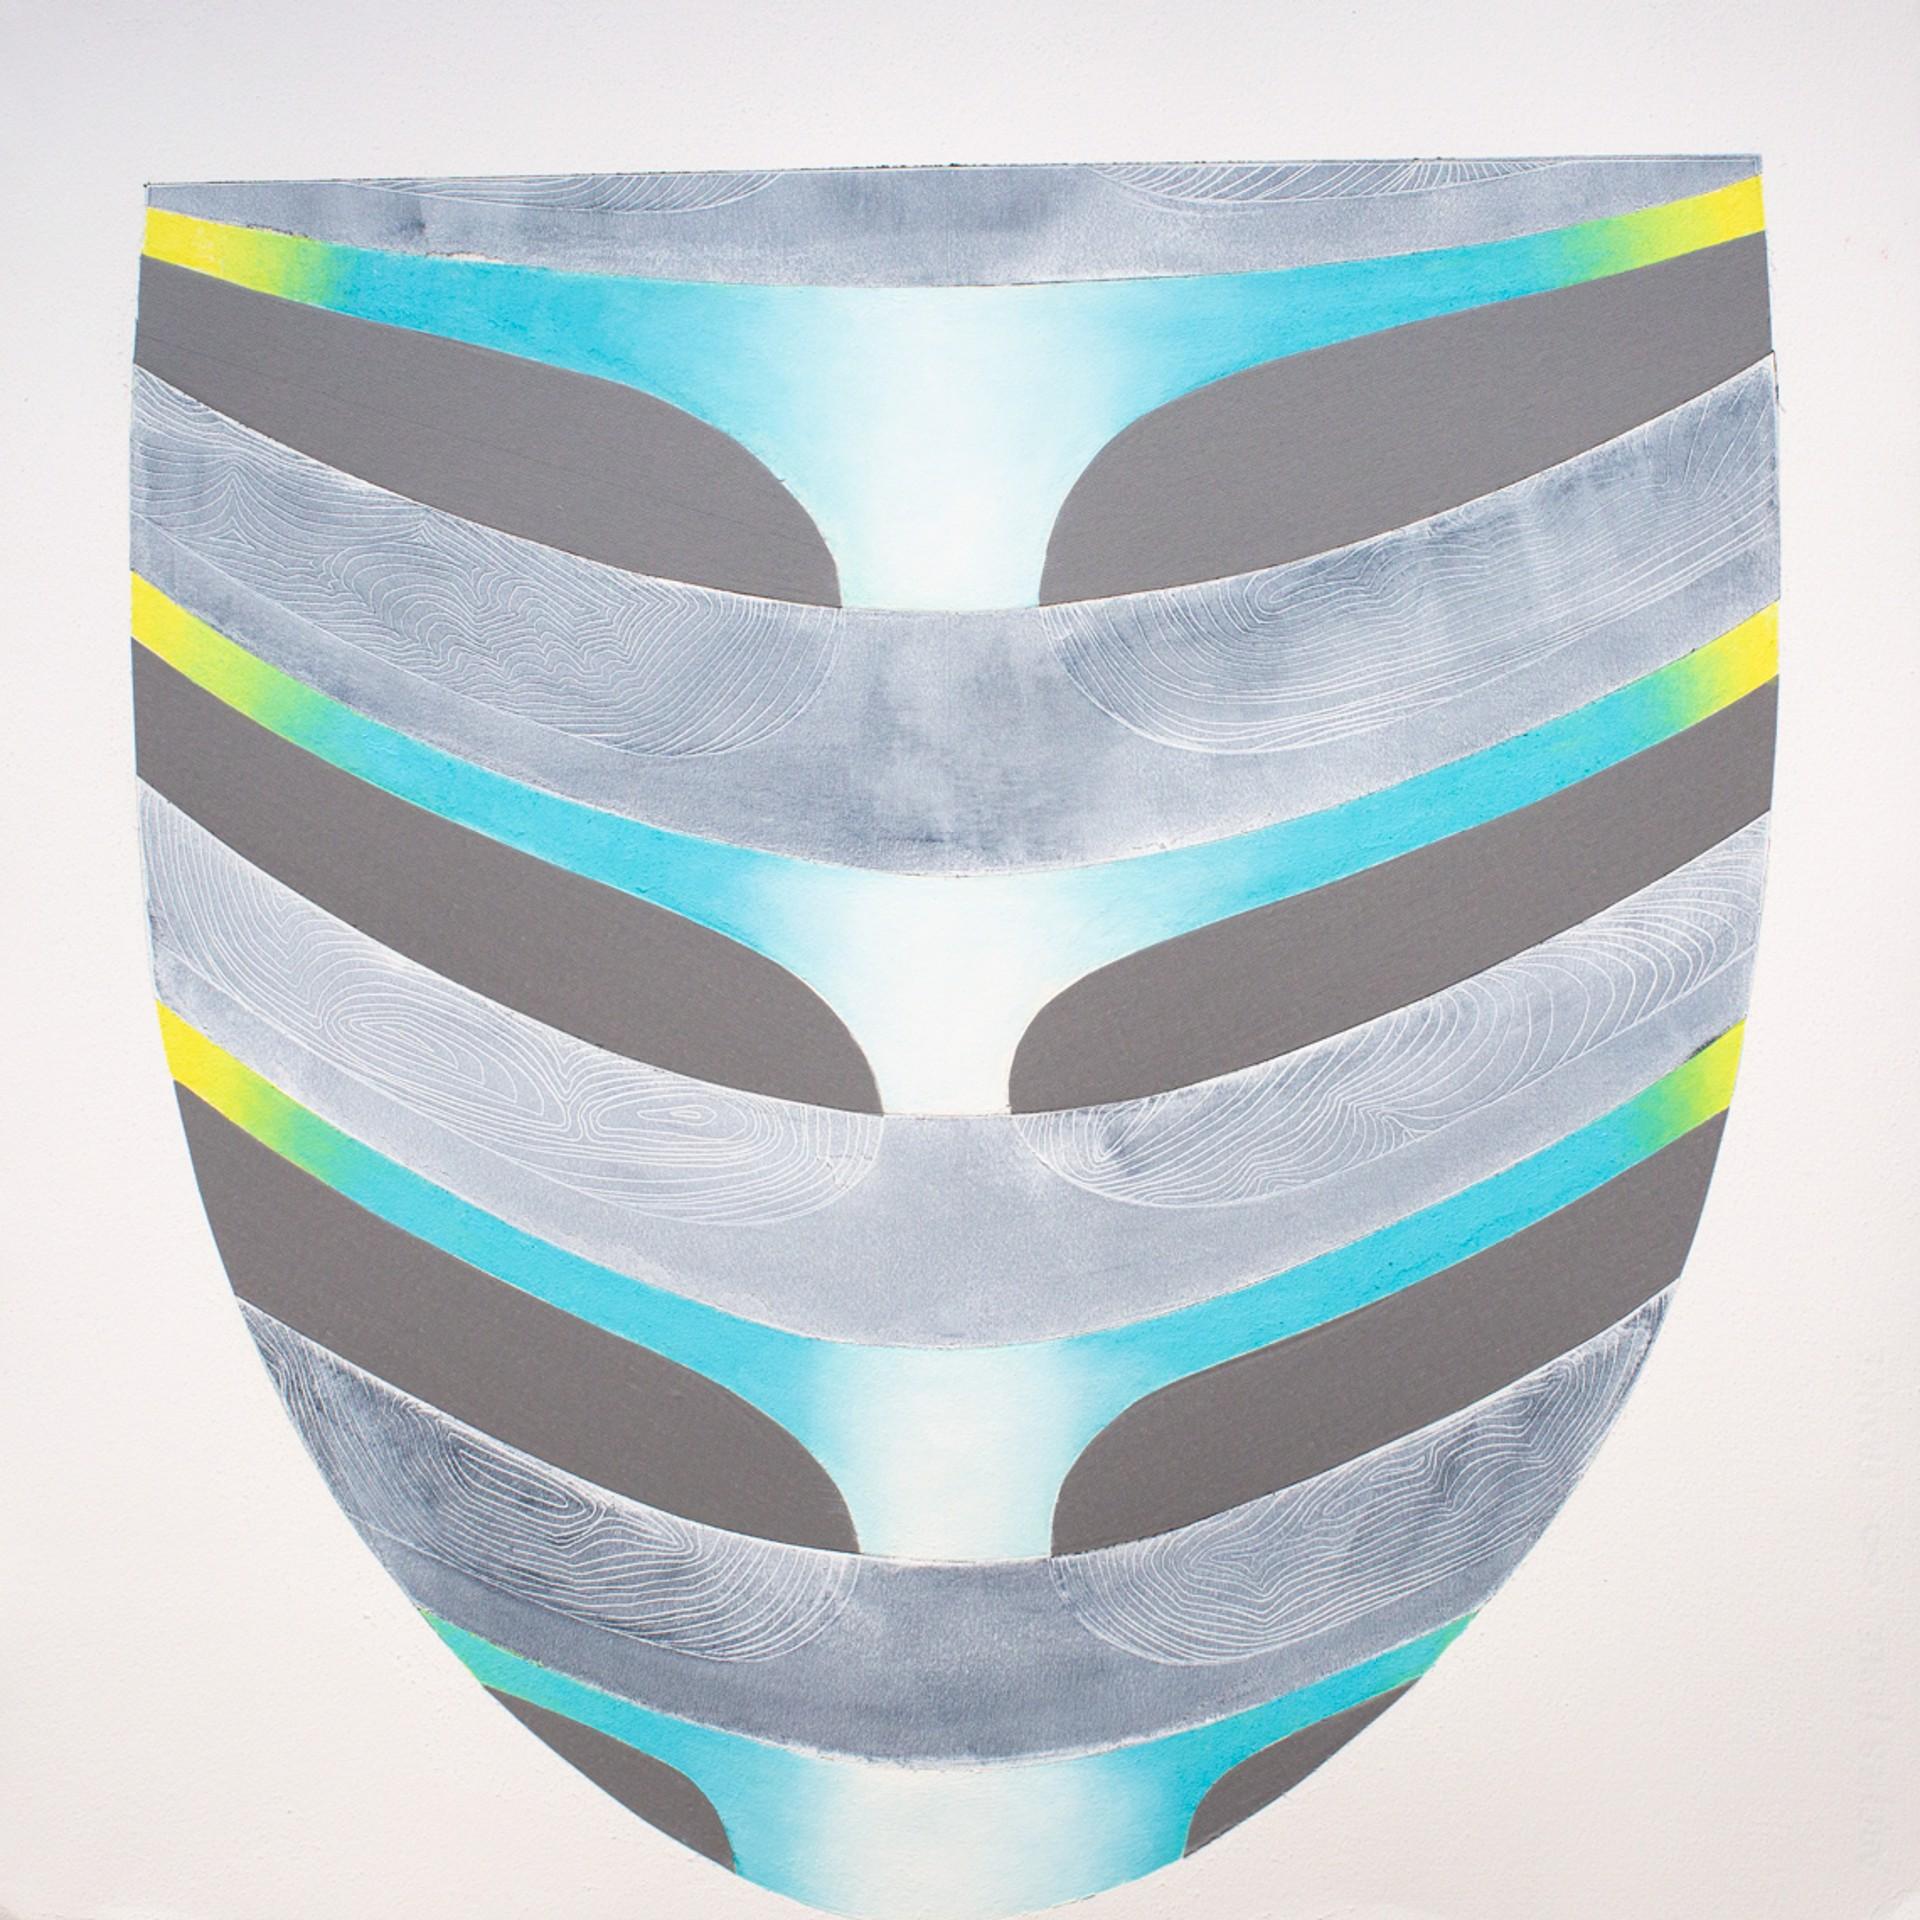 Untitled, Radiant Series by Stella Alesi